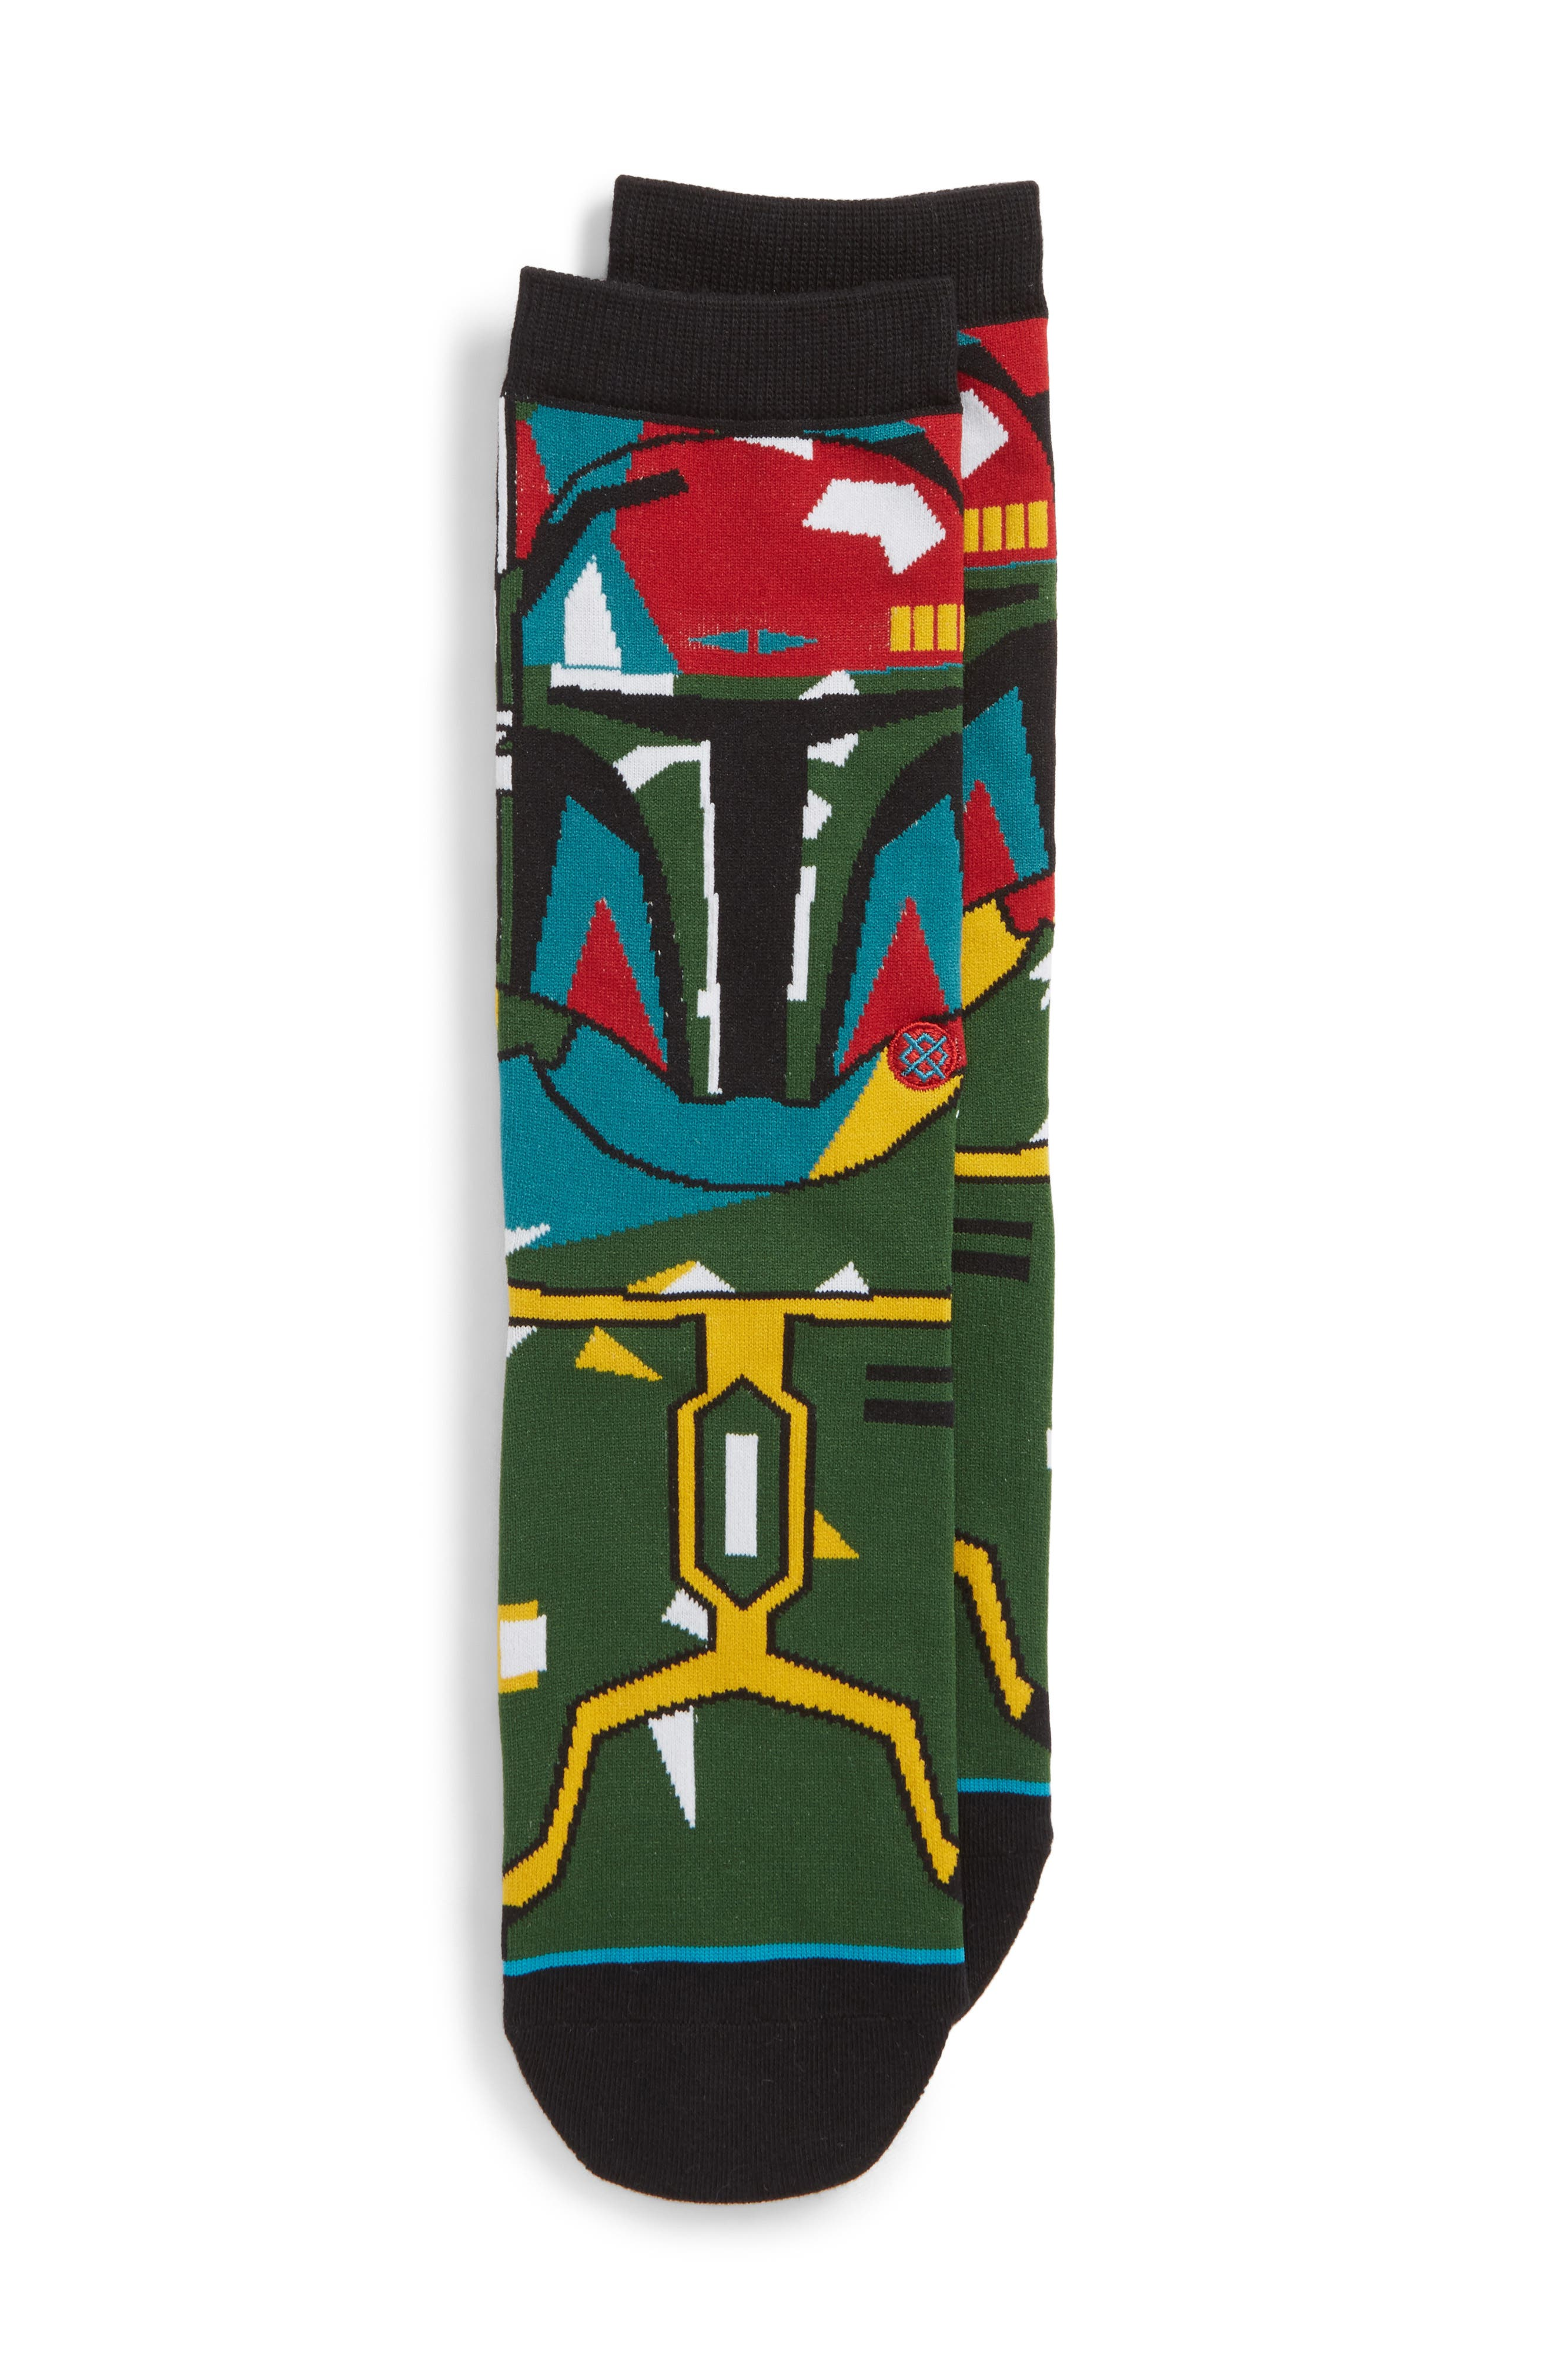 Main Image - Stance x Star Wars Boba Mosaic Socks (Kids)